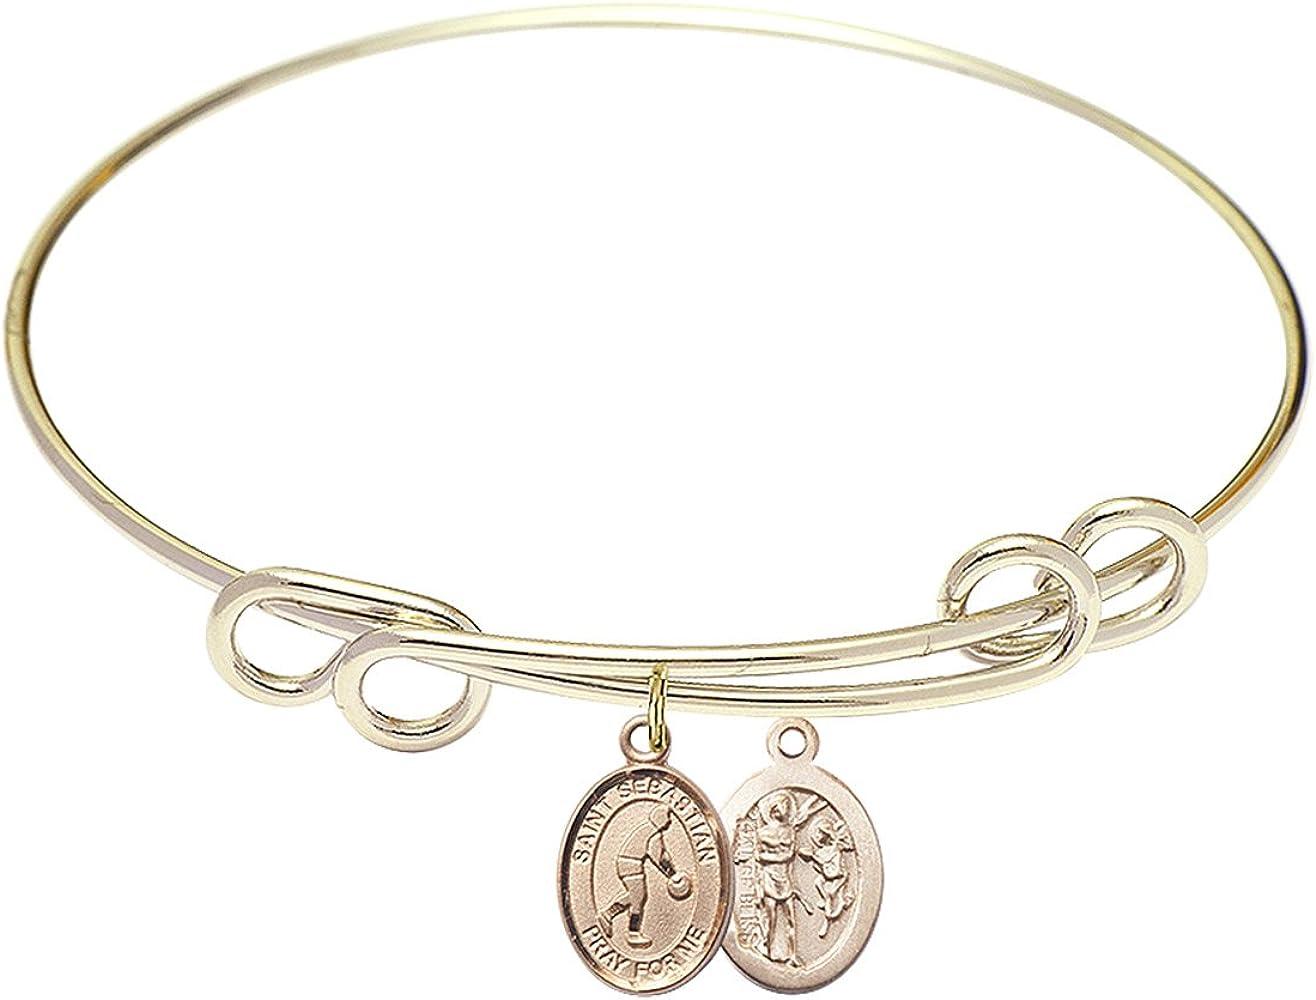 DiamondJewelryNY Double Loop Bangle Bracelet with a St. Sebastian/Basketball Charm.